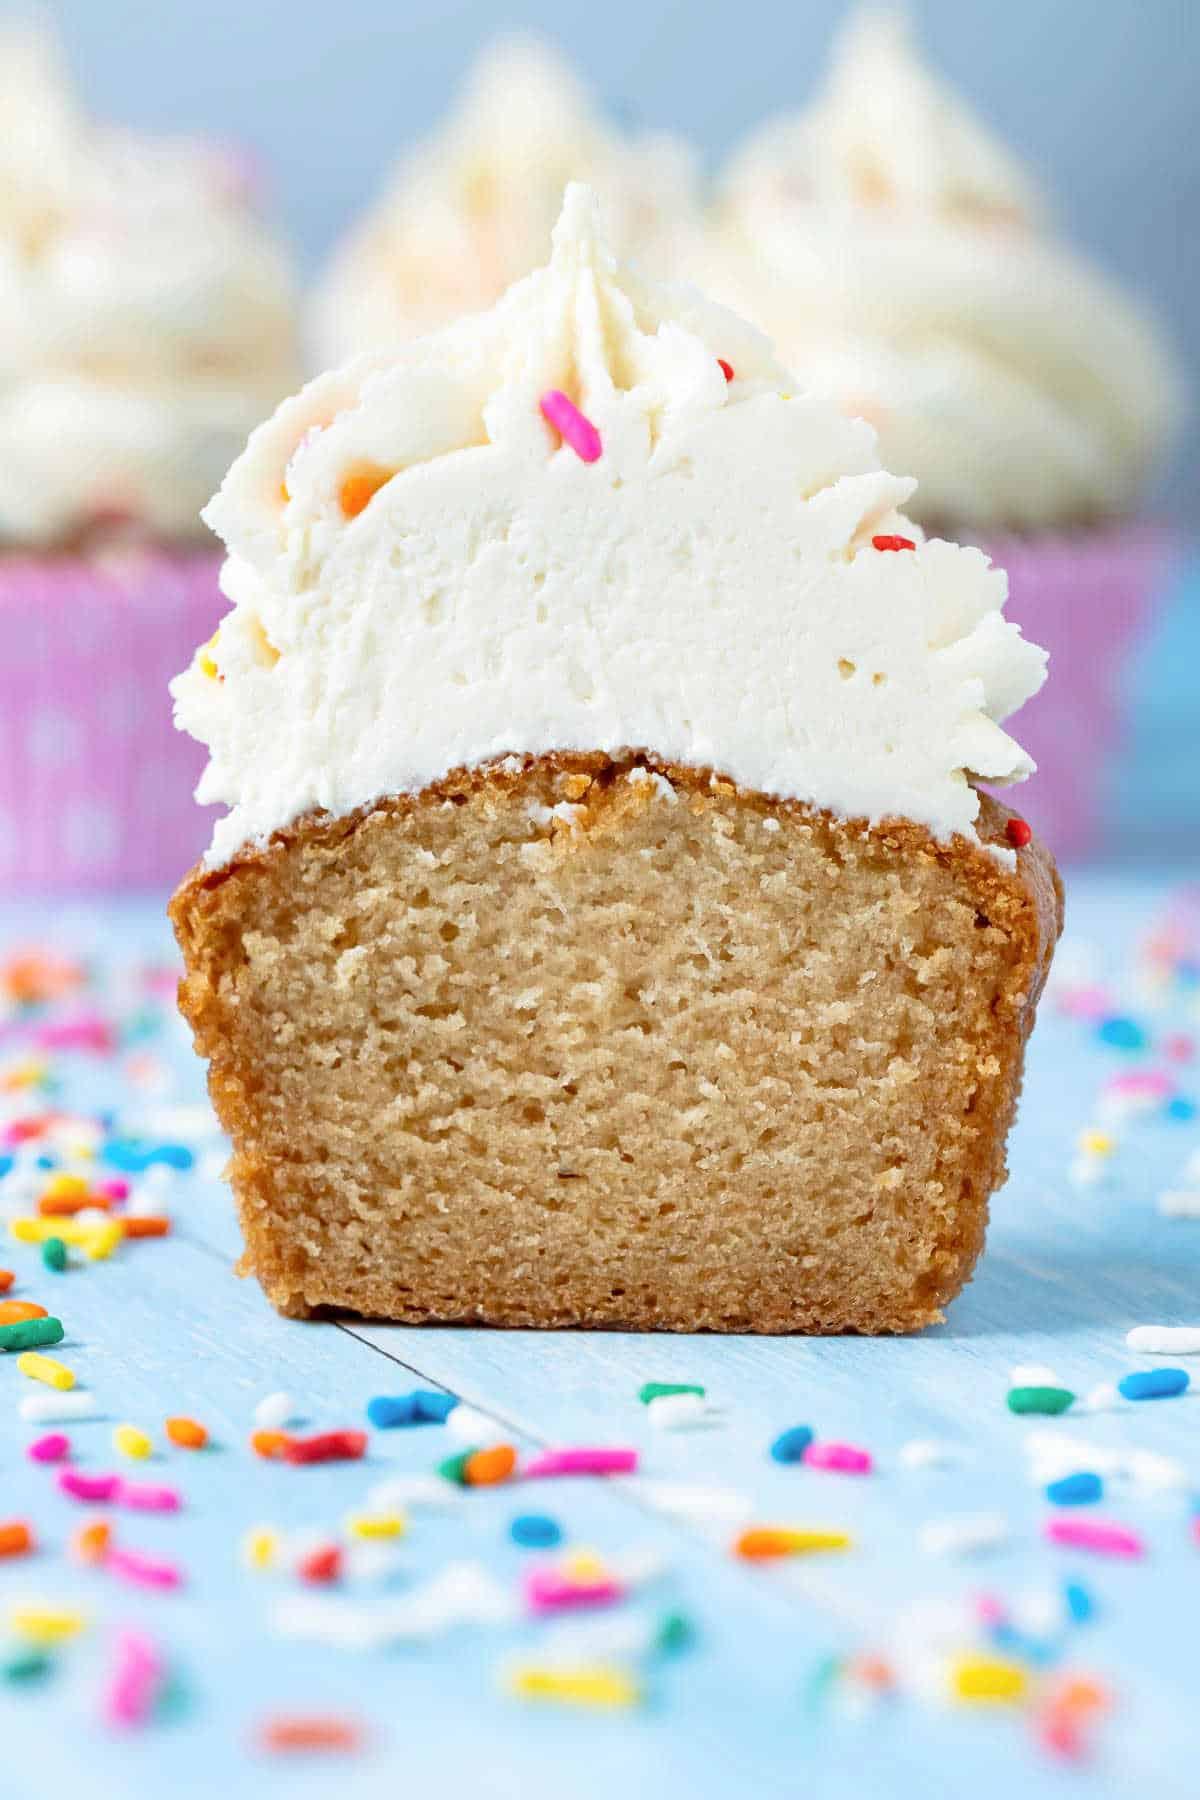 Vegan gluten free vanilla cupcake cut in half to show the center.